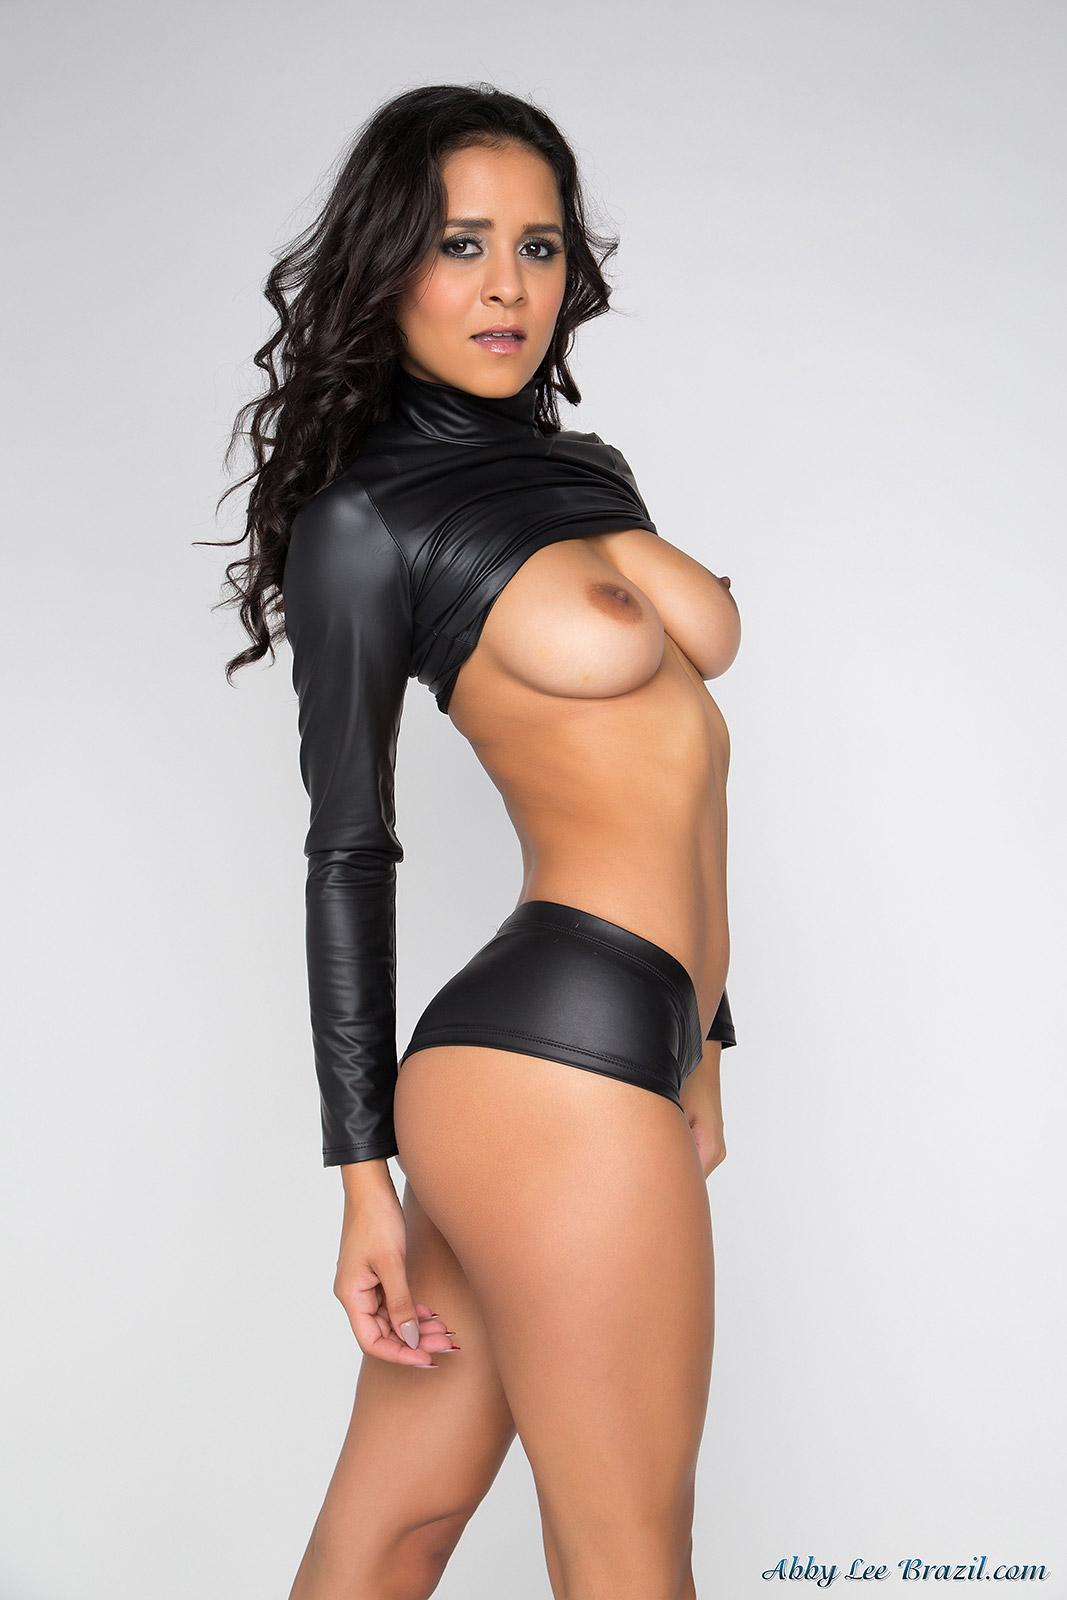 Abby Lee Brazil Porn